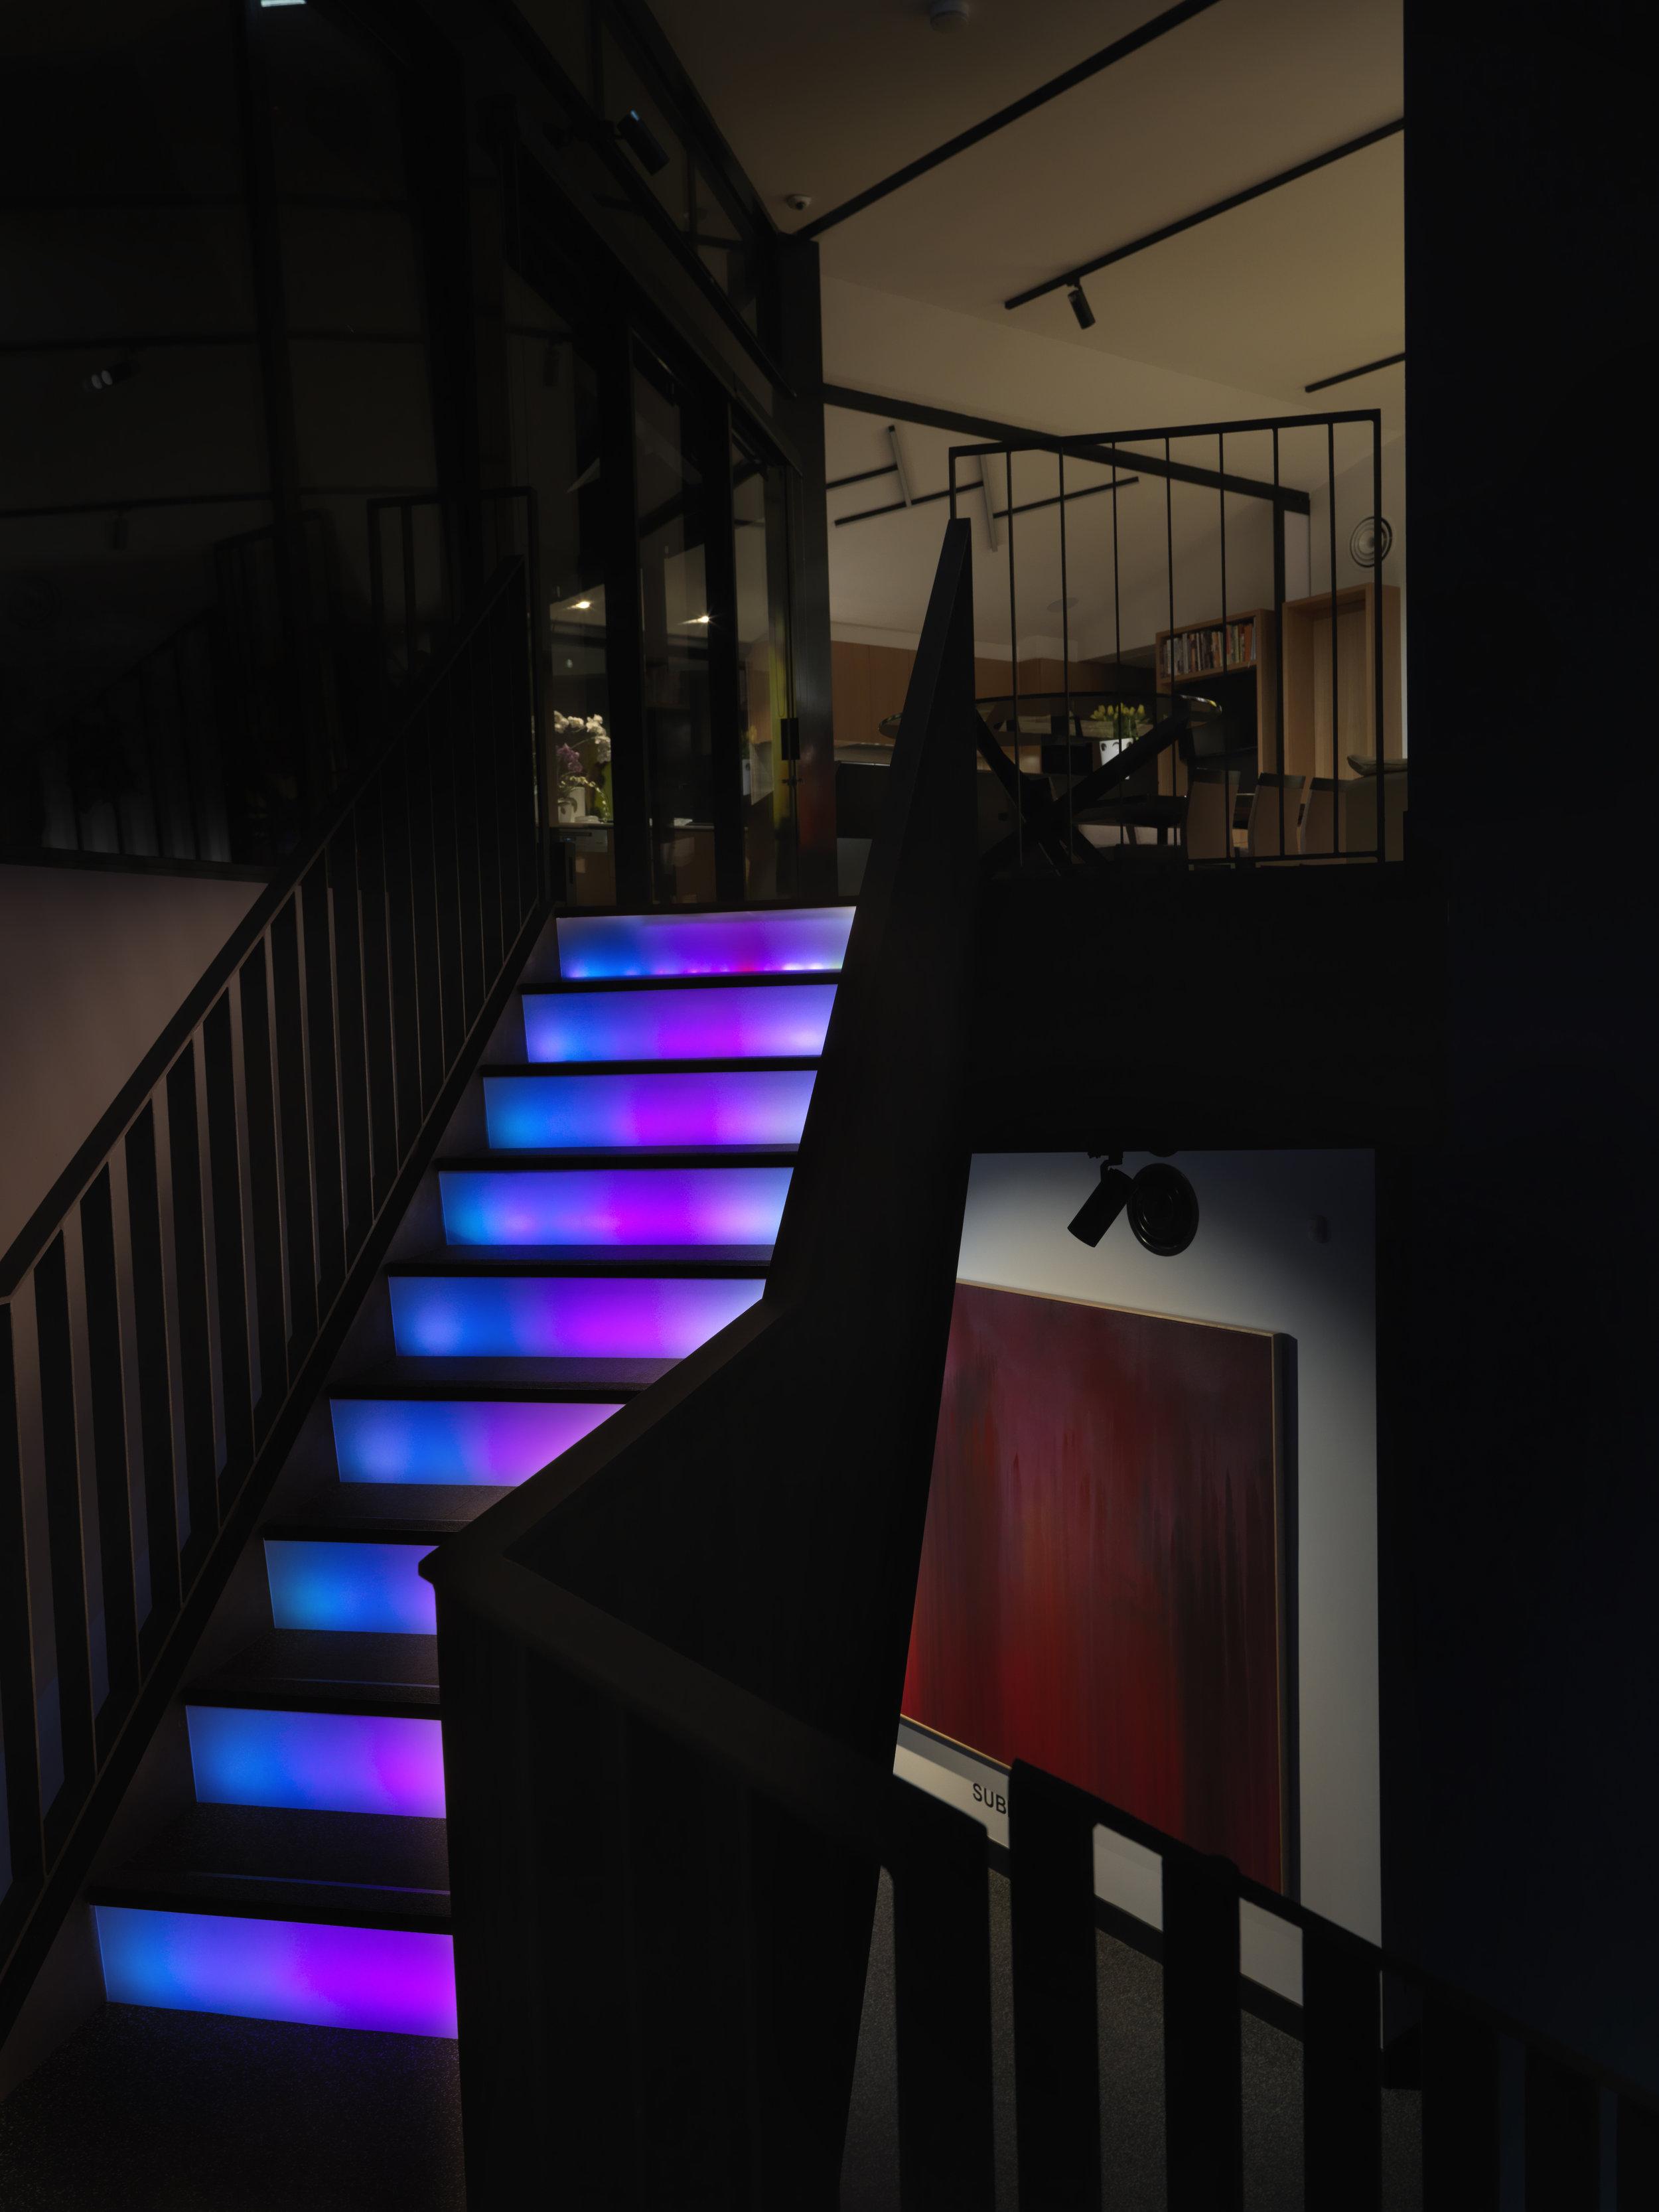 ilanel_JAHM_39 Interactive Steps-03.jpg